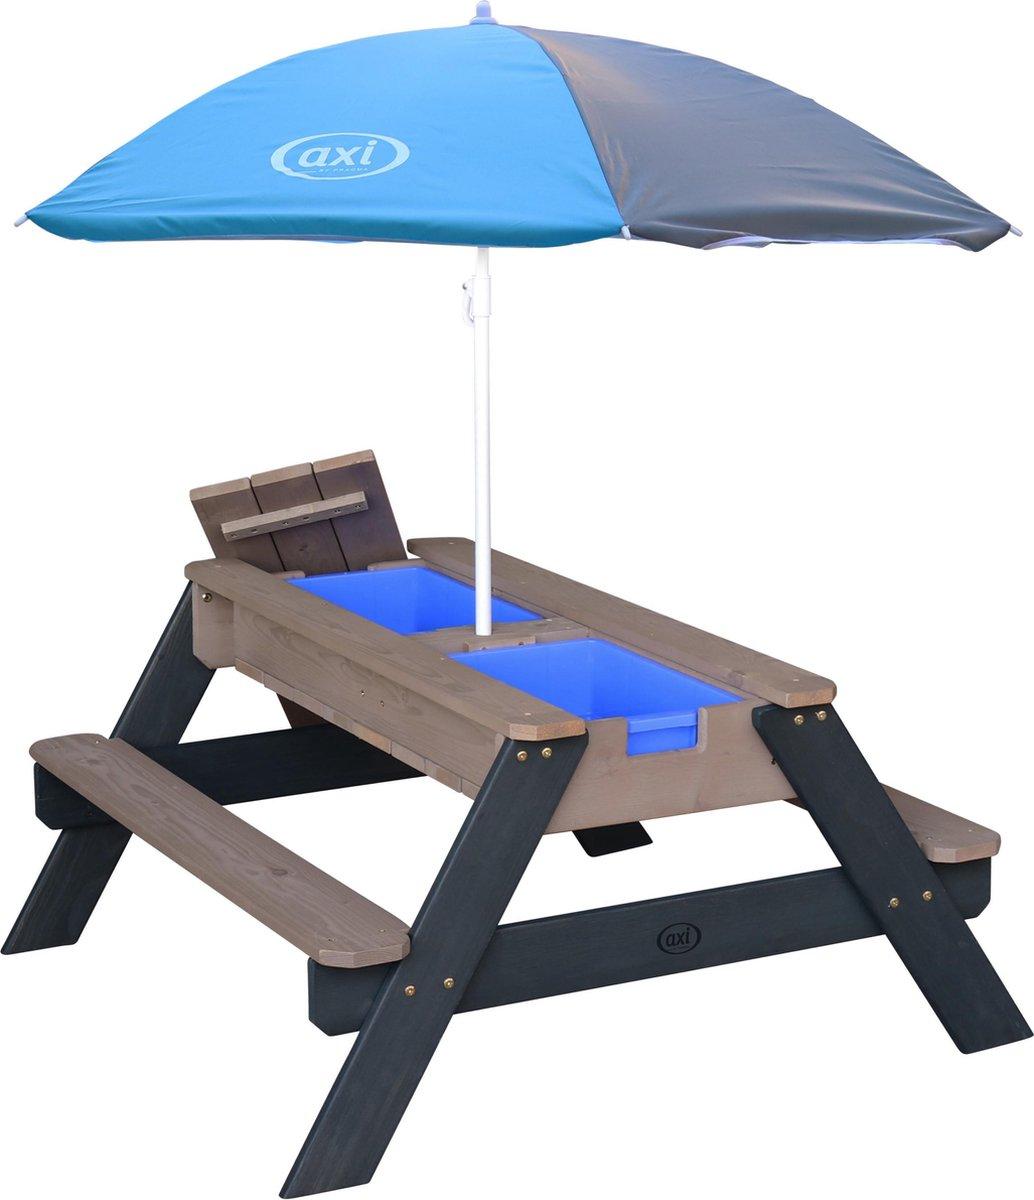 AXI Nick Zand & Water Picknicktafel Antraciet/grijs - Verstelbare Parasol   FSC Hout